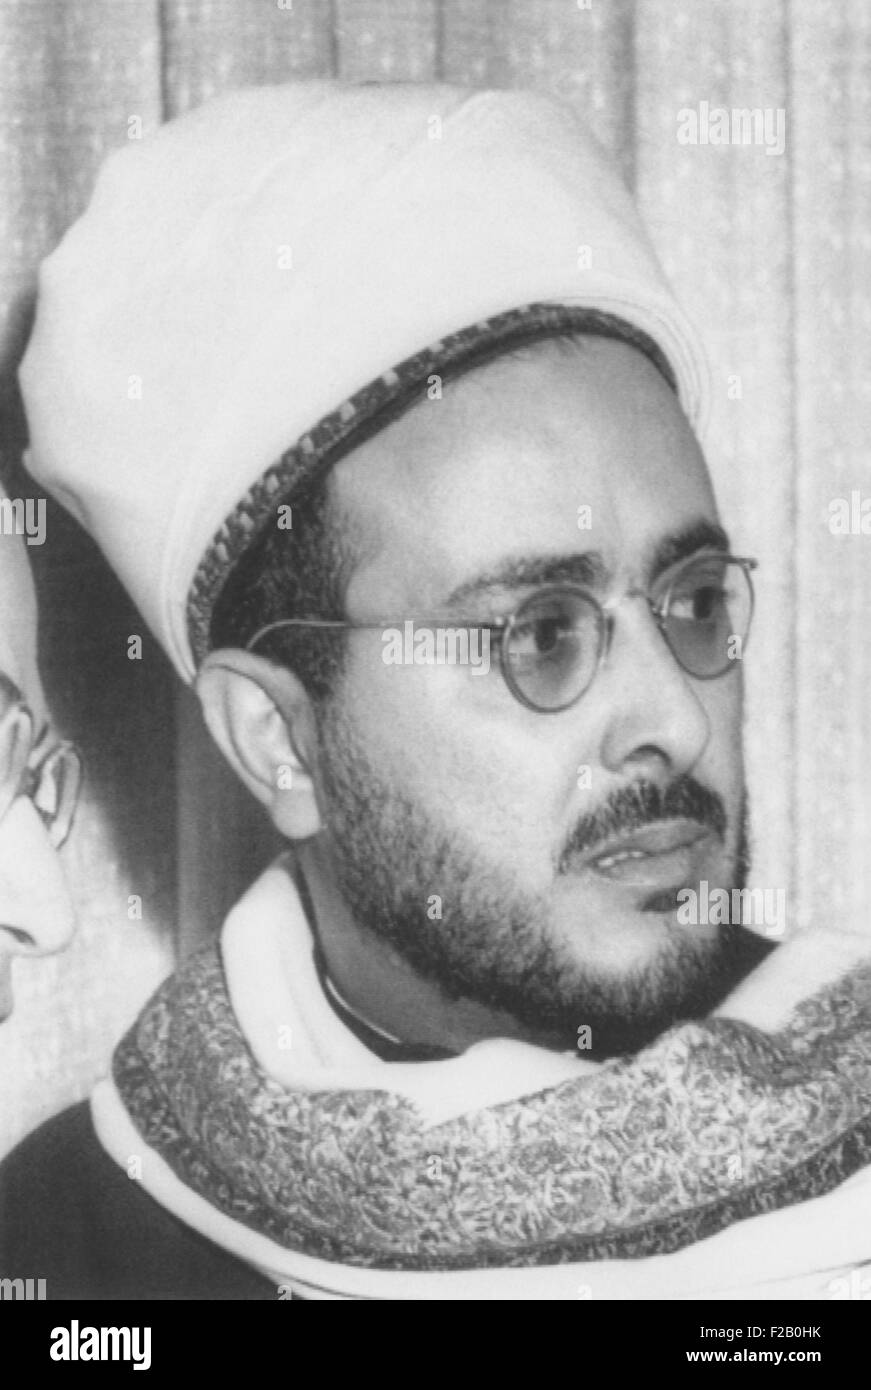 Prince Sayf Al-Islam Abdullah condemned for revolt against, King Sayf al-Islam Ahmad. March 11, 1955. The Prince, - Stock Image